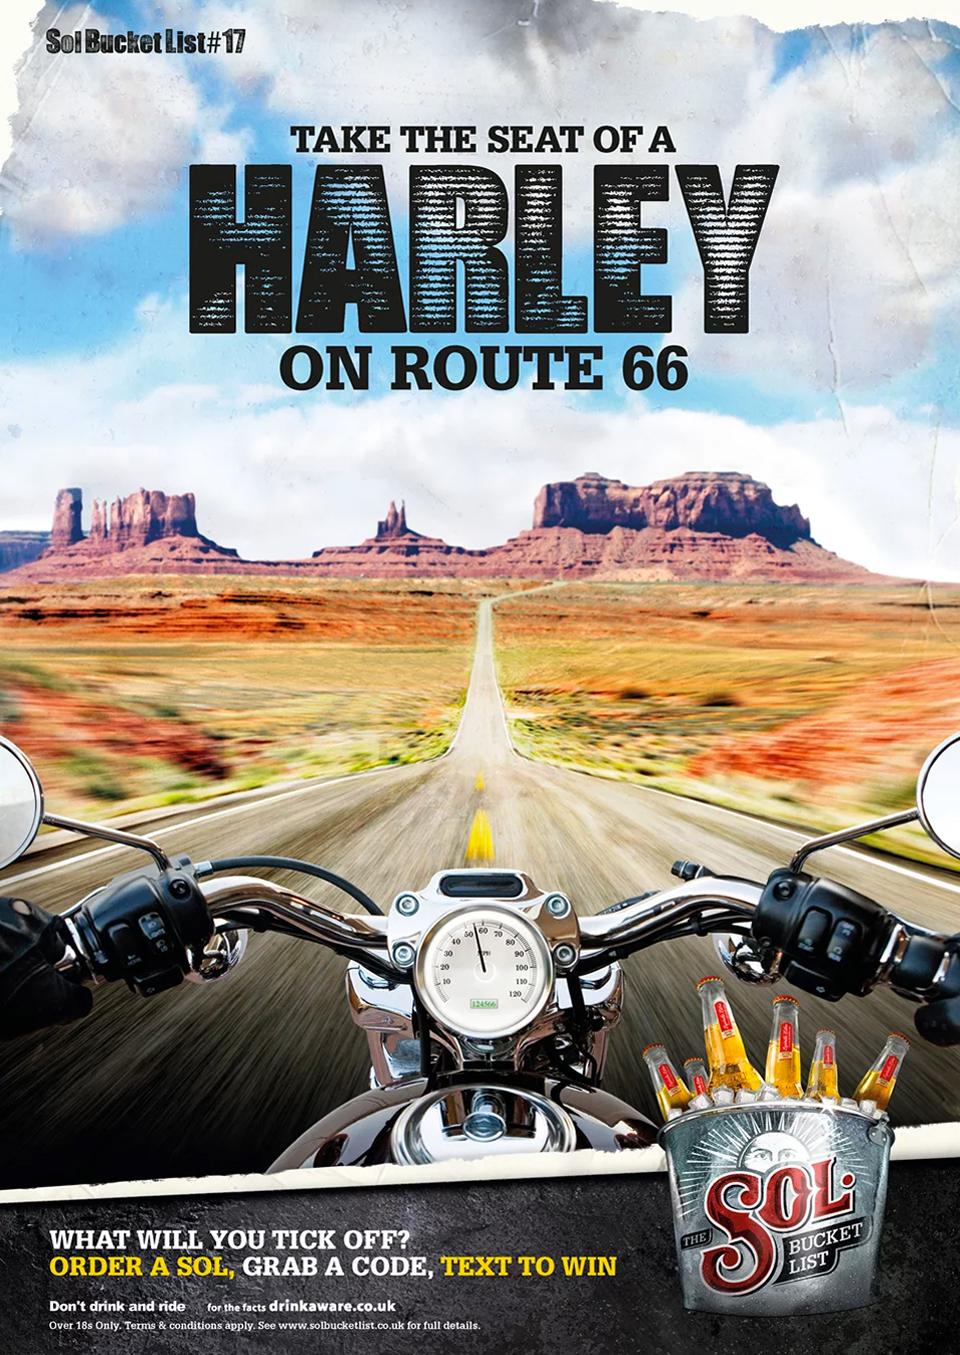 Harley_sol.jpg